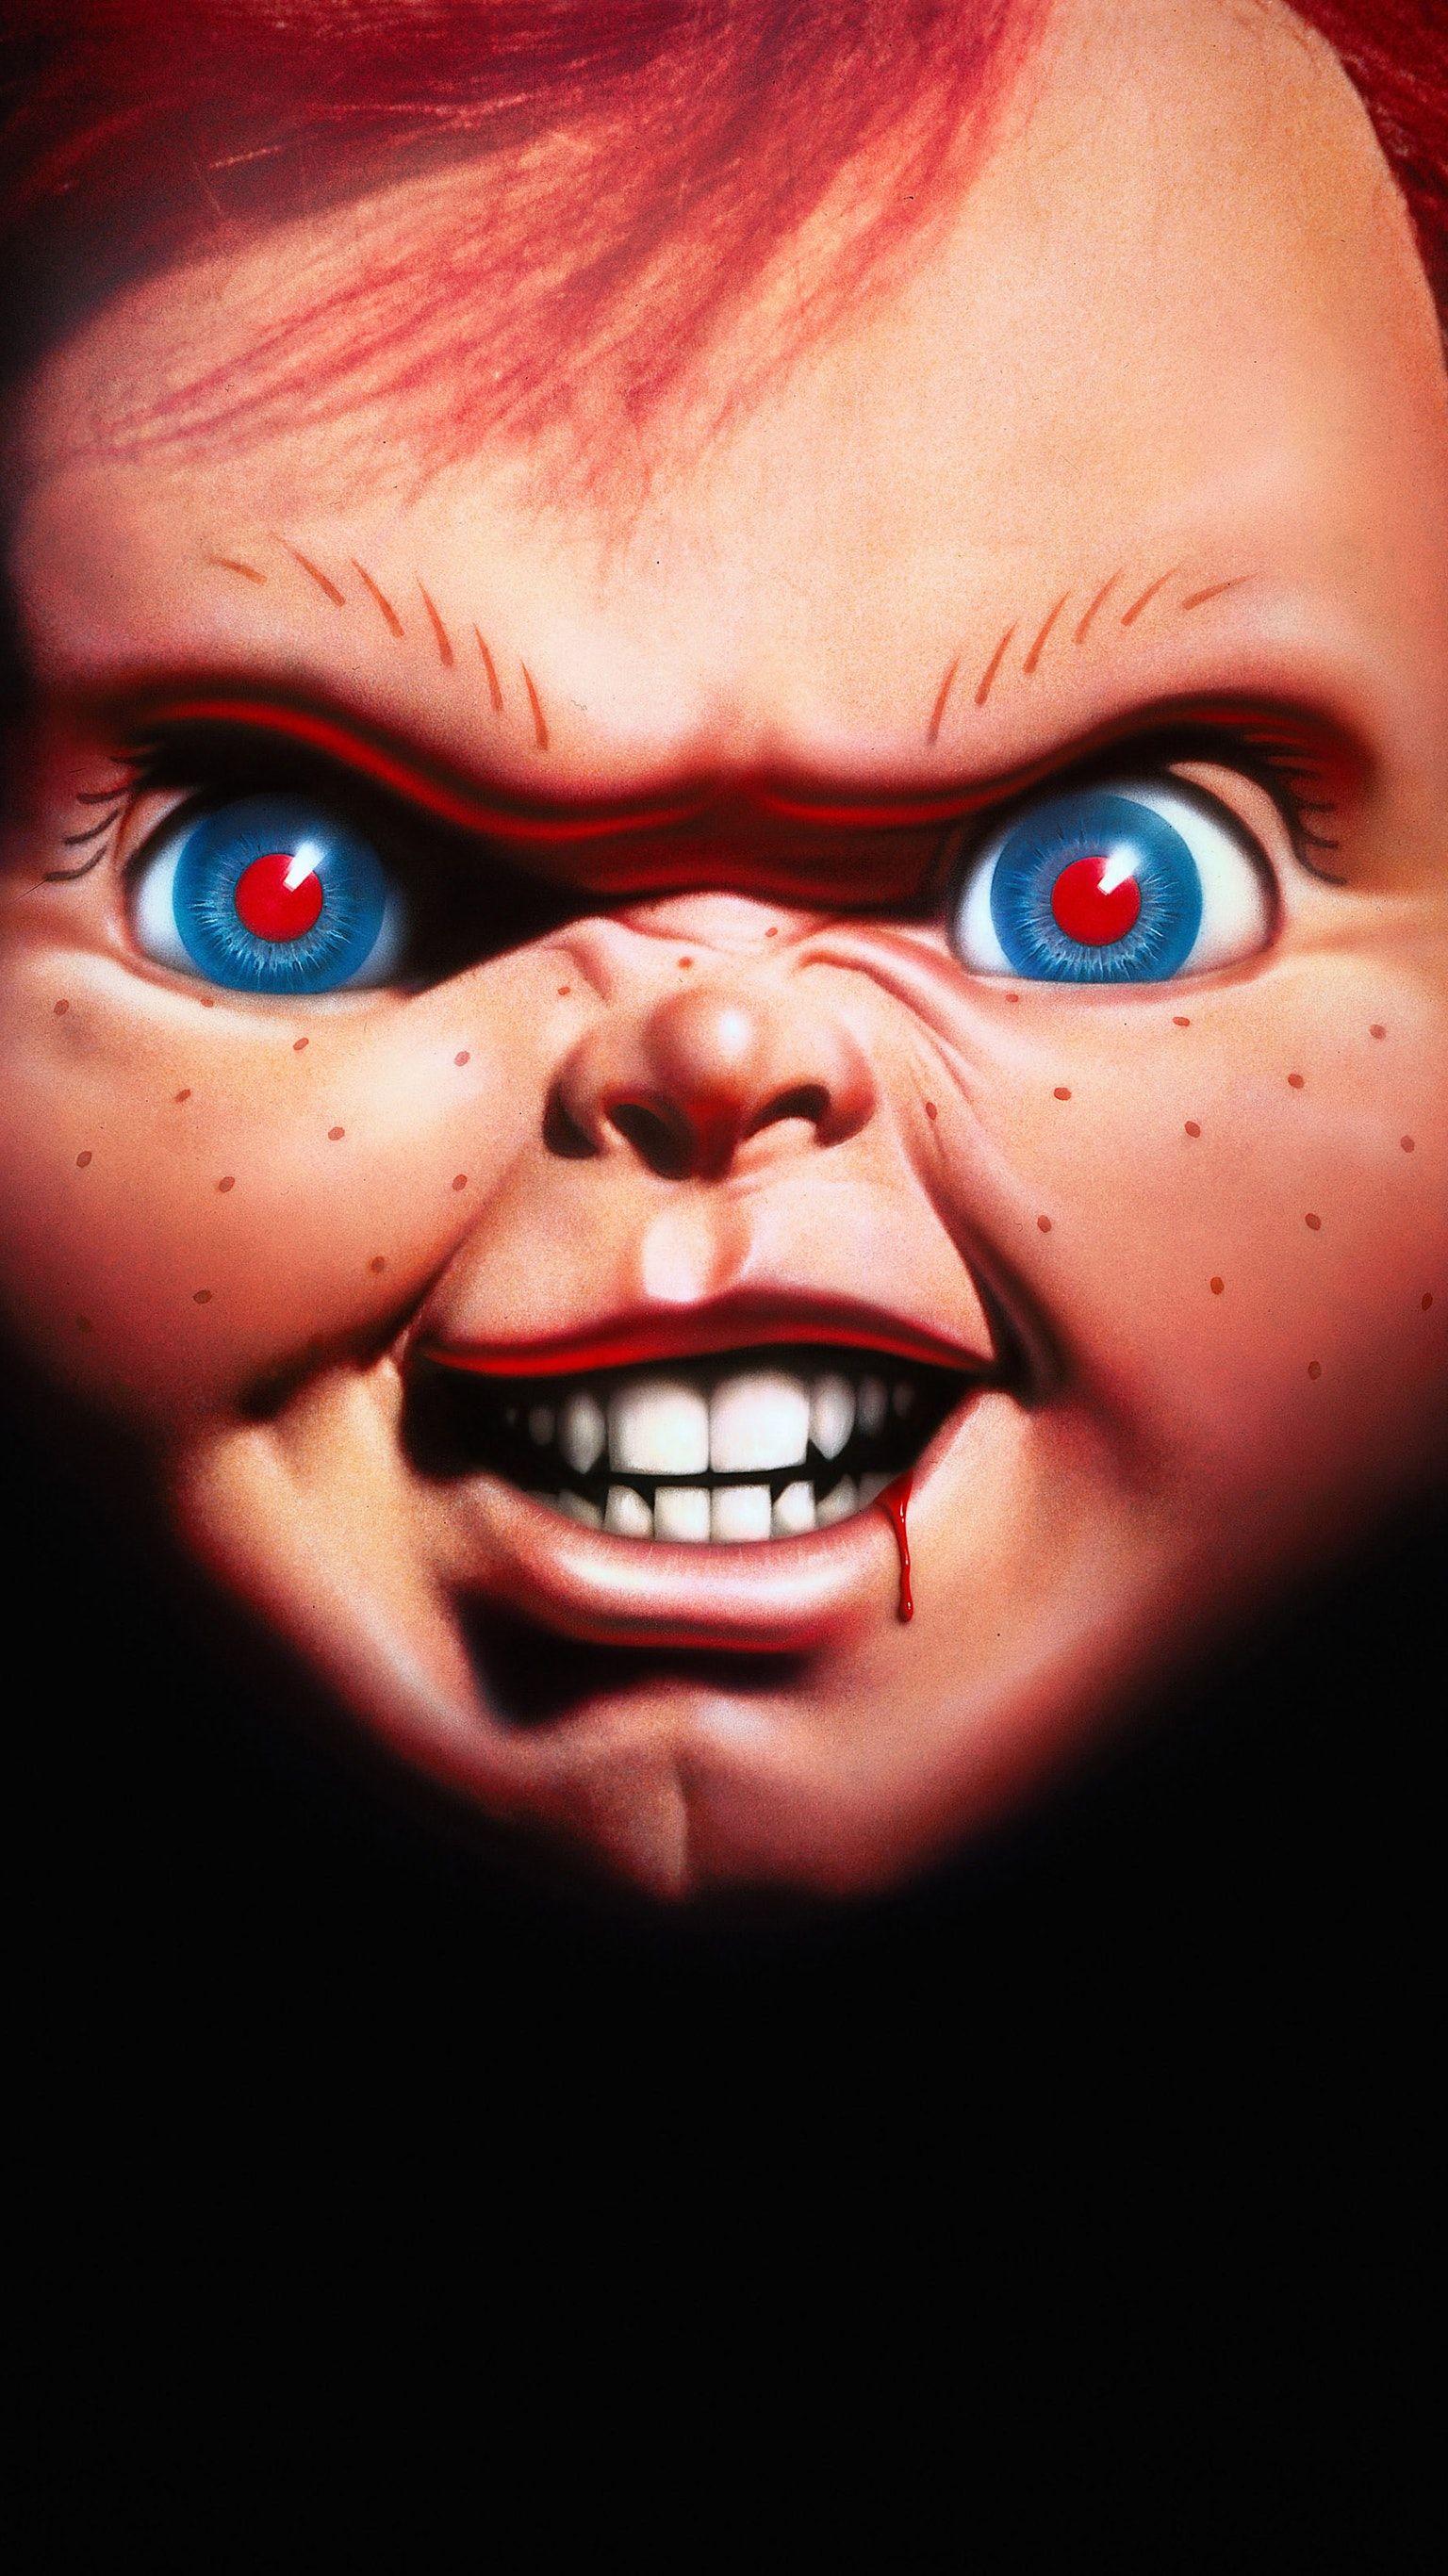 Child S Play 3 1991 Phone Wallpaper Moviemania Childs Play Chucky Chucky Movies Chucky